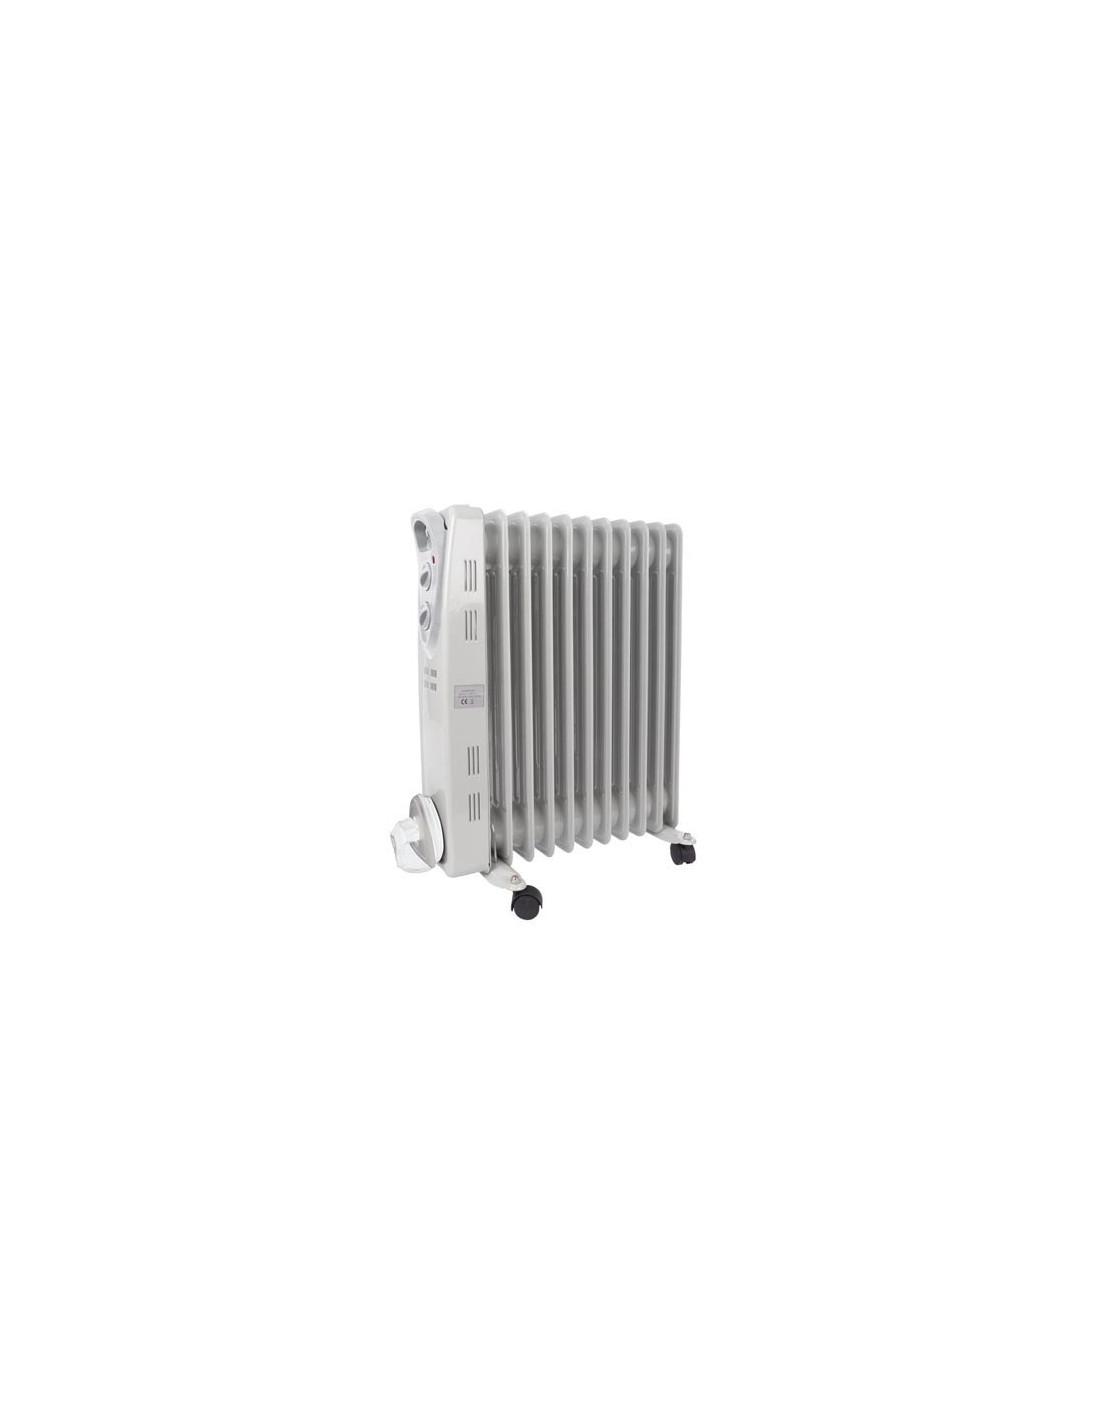 Consommation radiateur bain d huile 20170701080439 - Radiateur bain d huile consommation ...